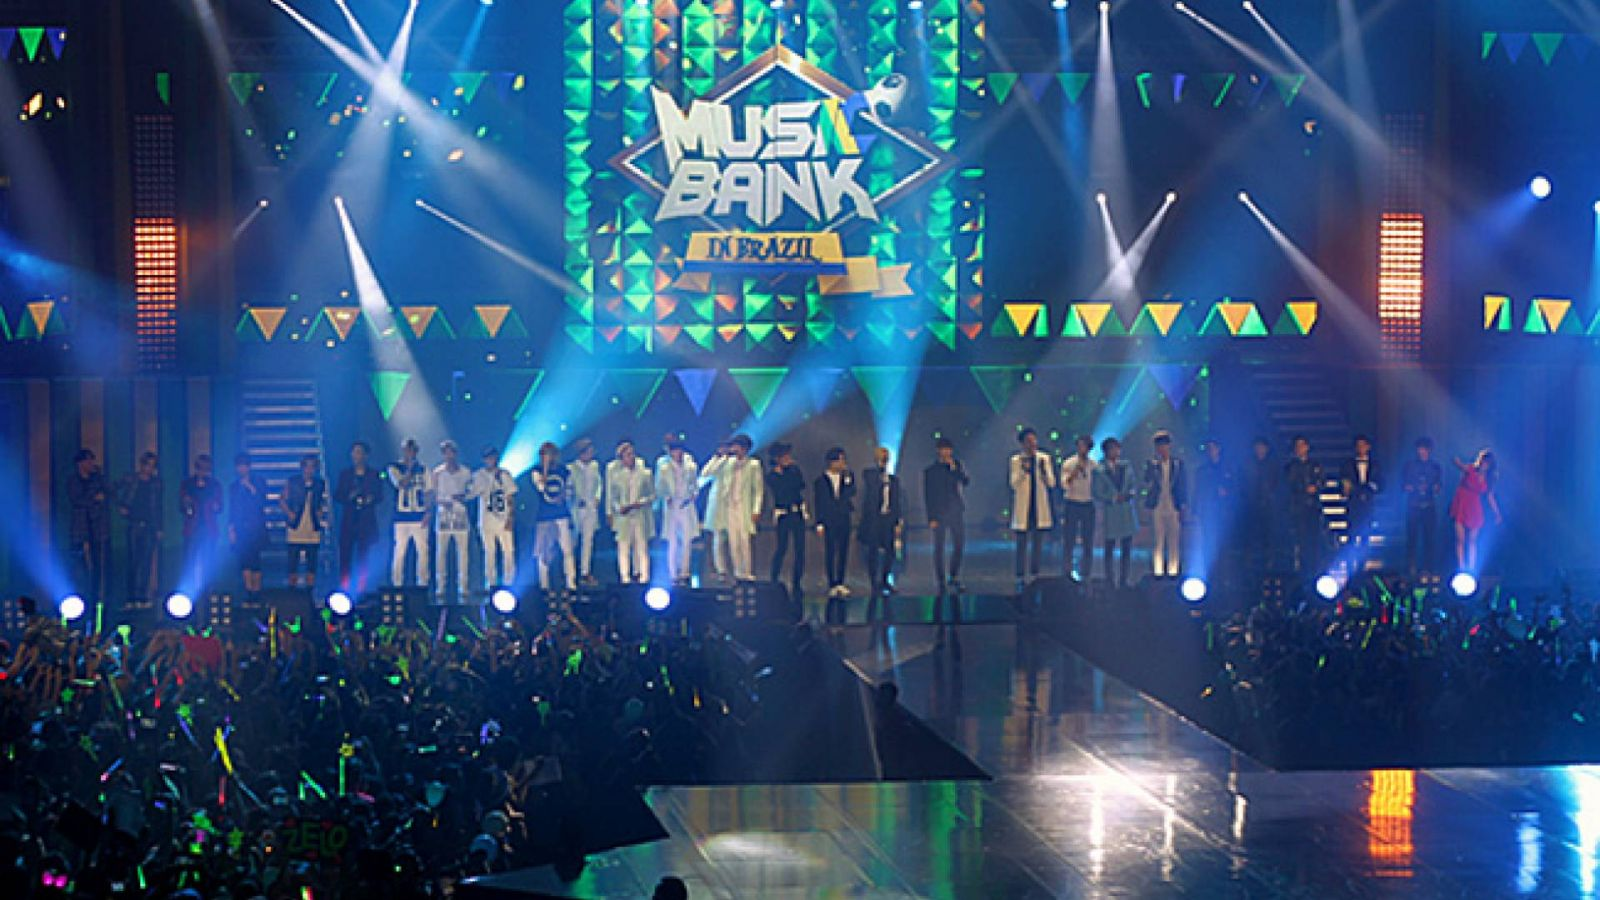 Music Bank in Brazil © Dennis Himura